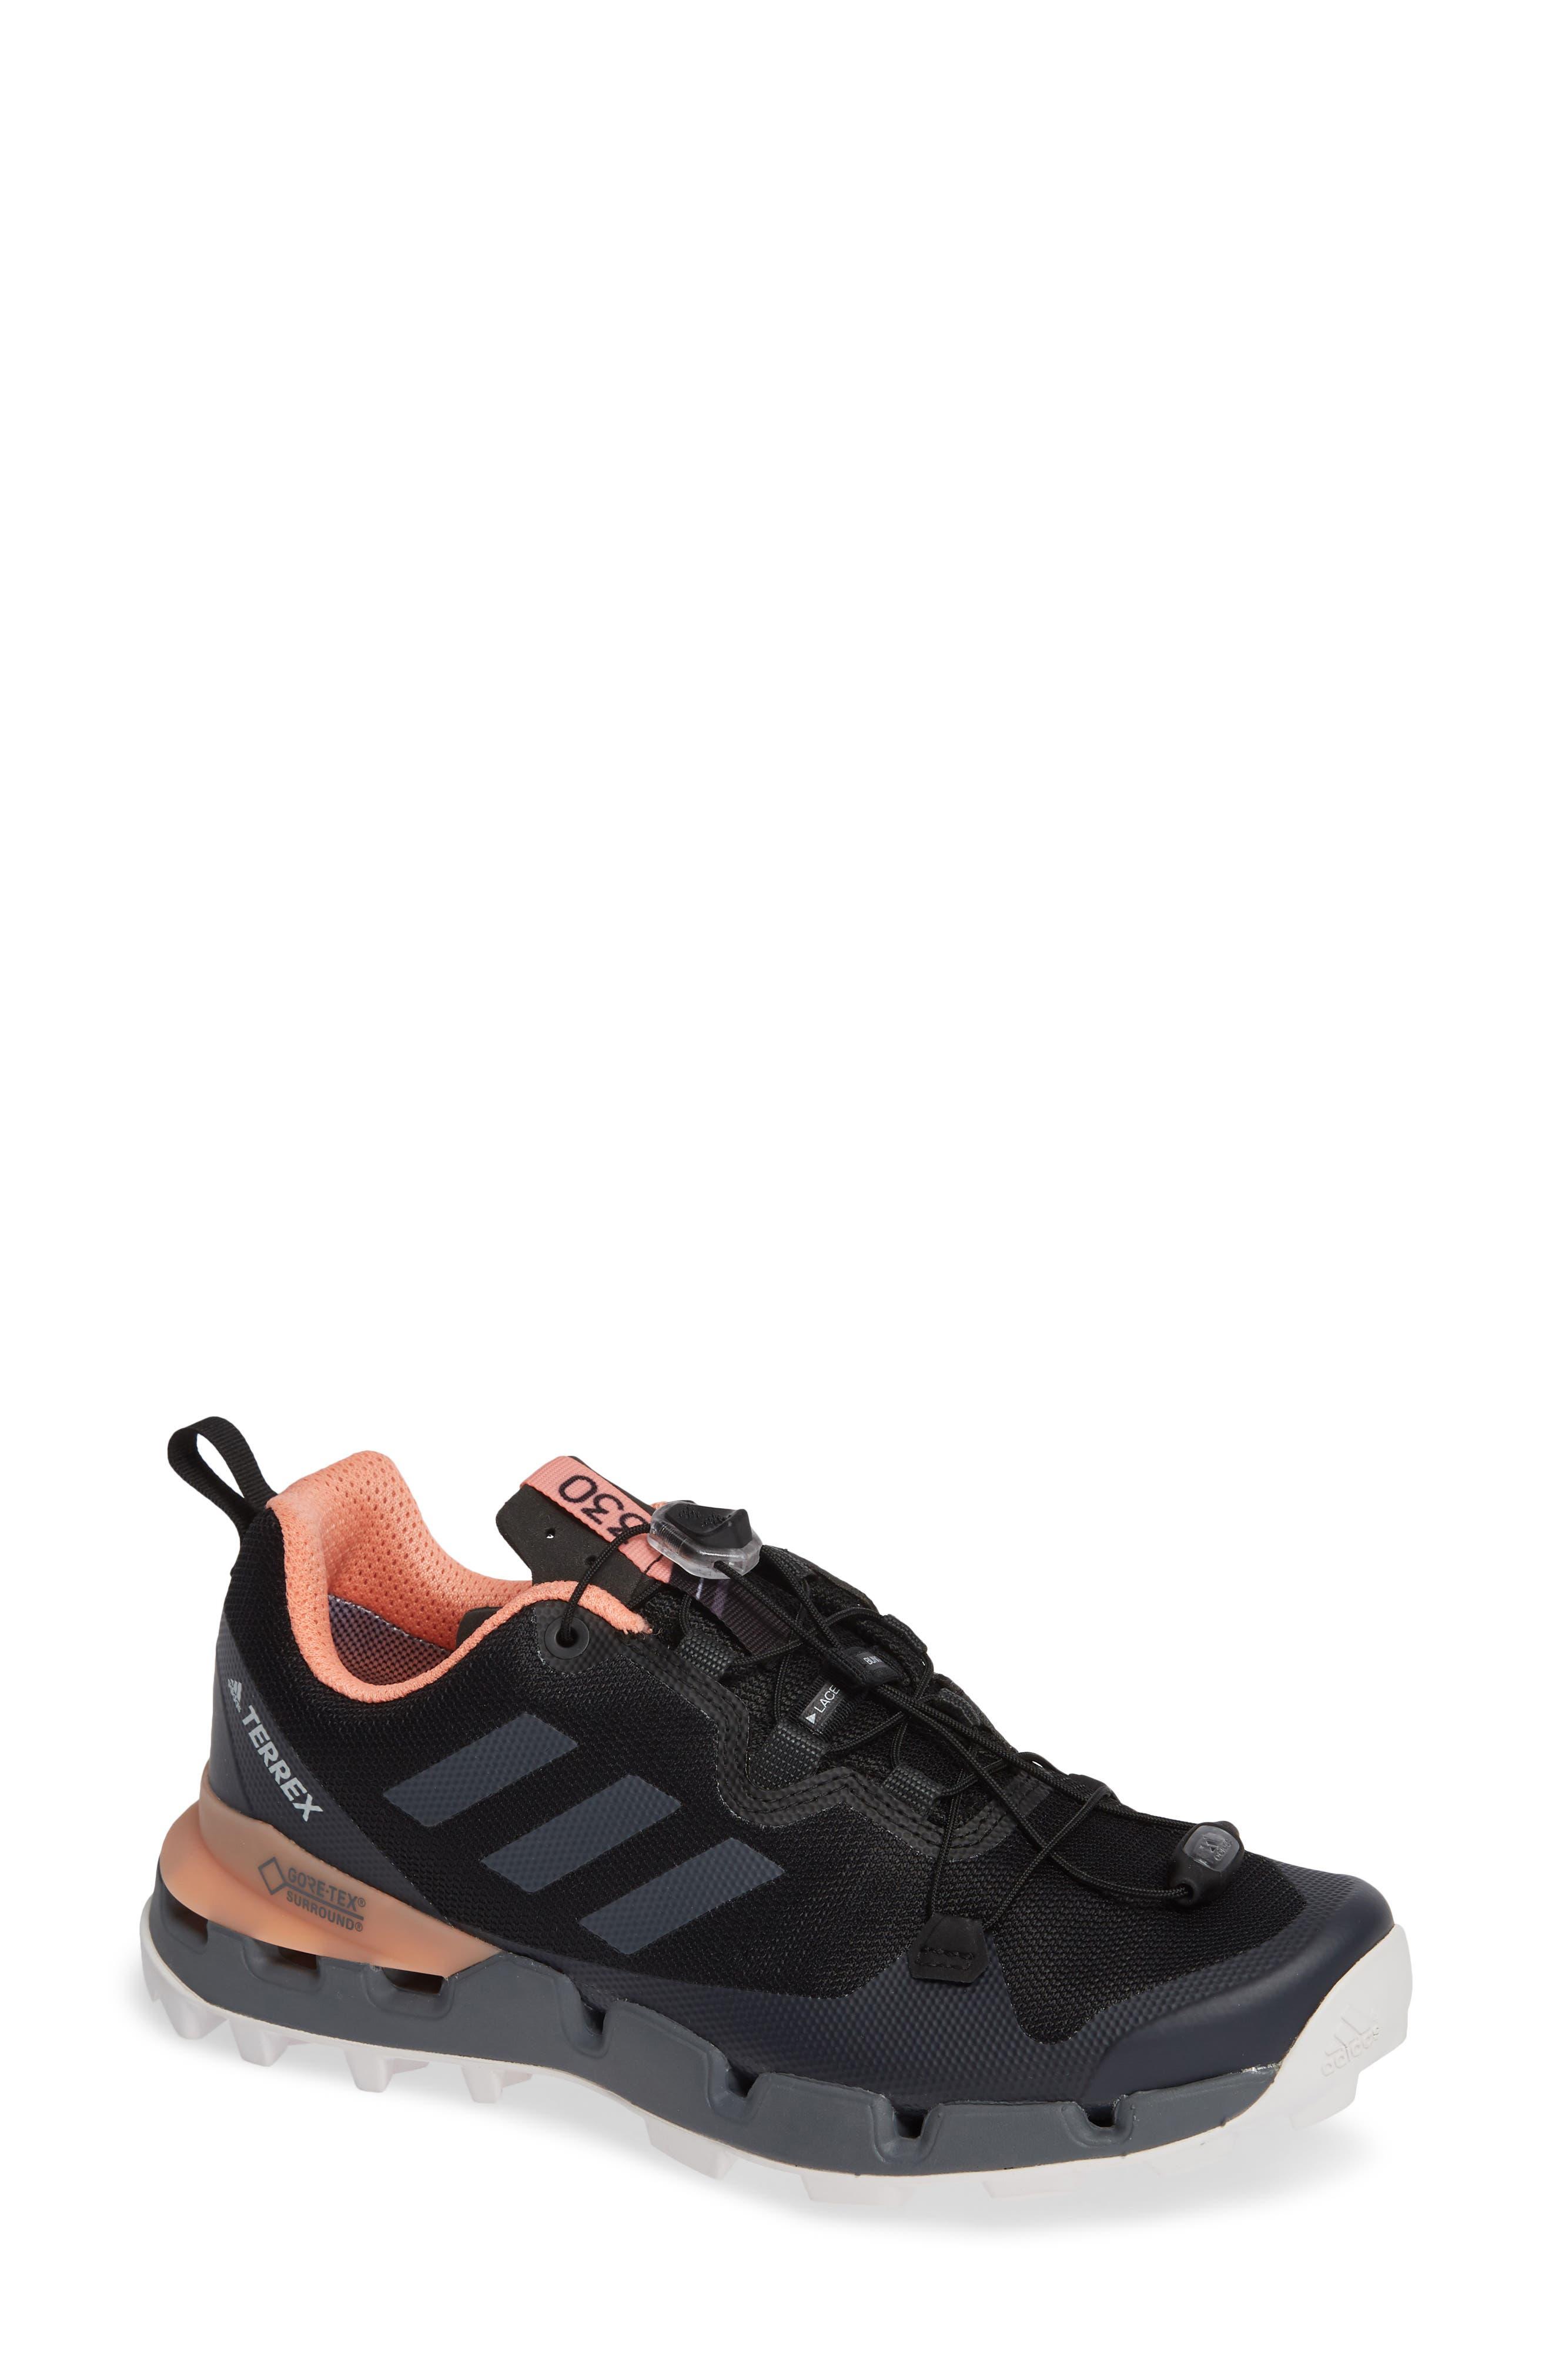 Terrex Fast GTX<sup>®</sup> Surround Hiking Shoe,                             Main thumbnail 1, color,                             BLACK/ GREY FIVE/ CHALK CORAL